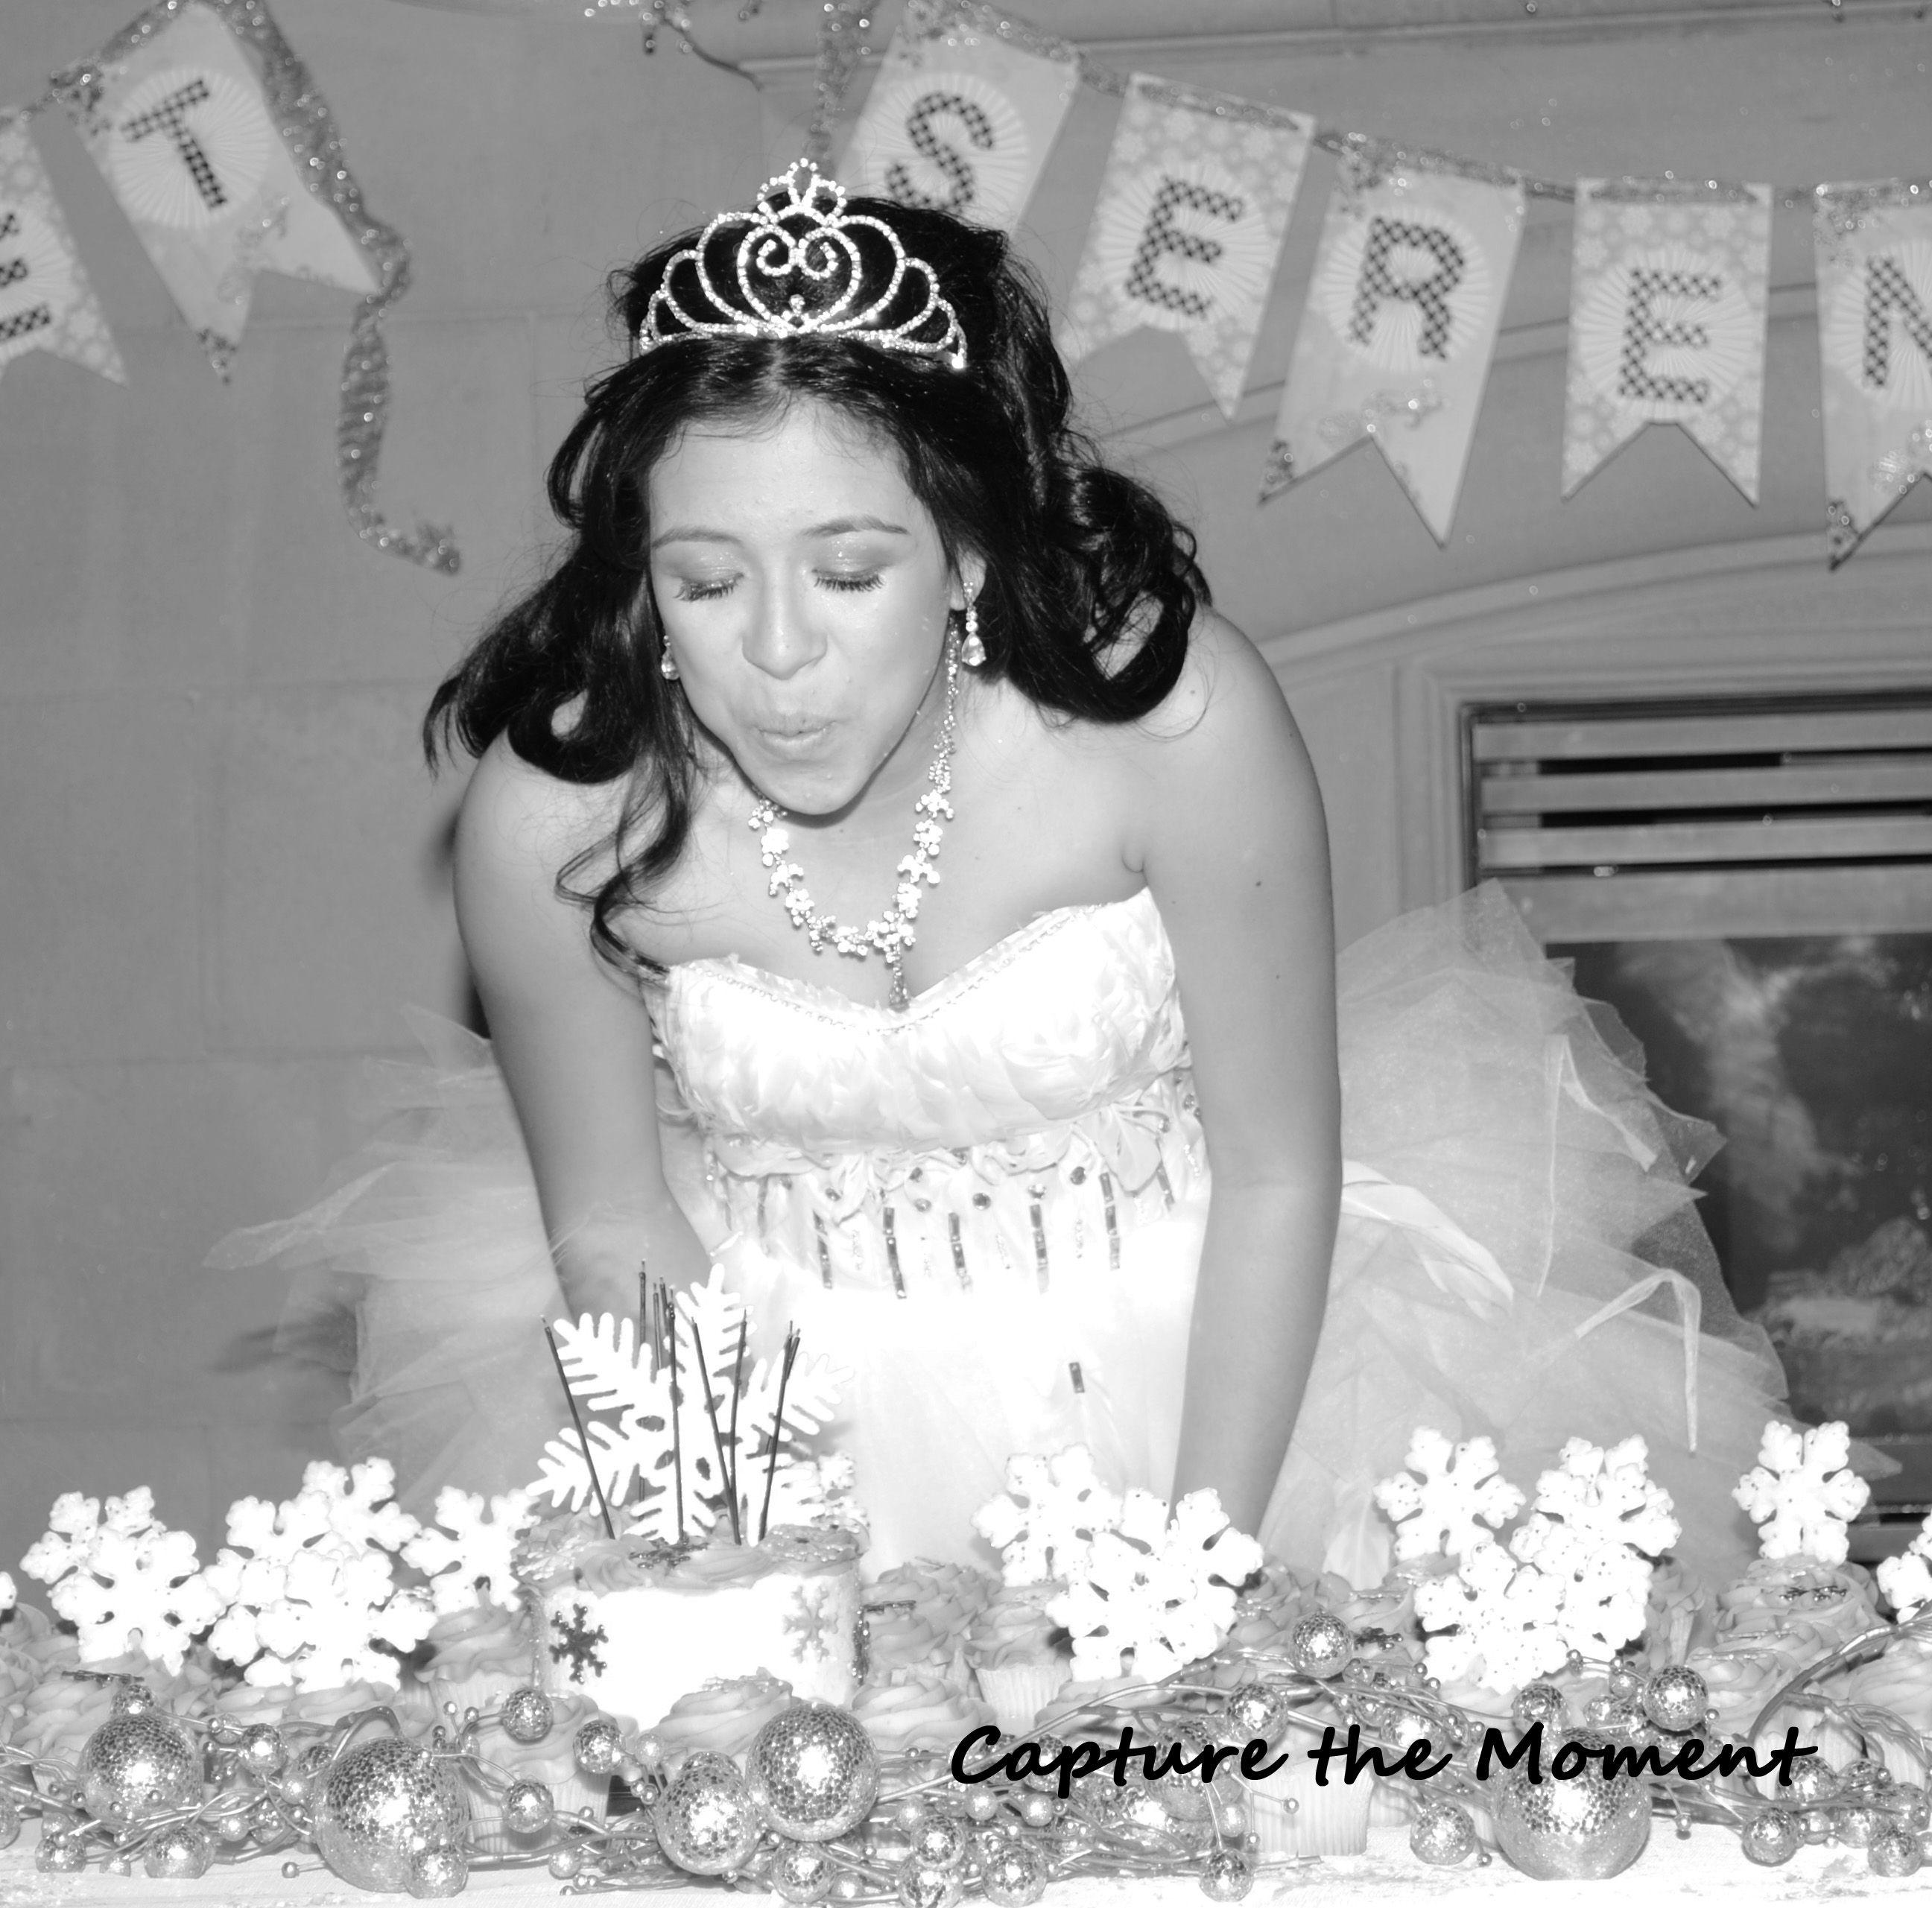 Sweet 16 Parties Visit us on Facebook at CapturetheMomentbyNikki